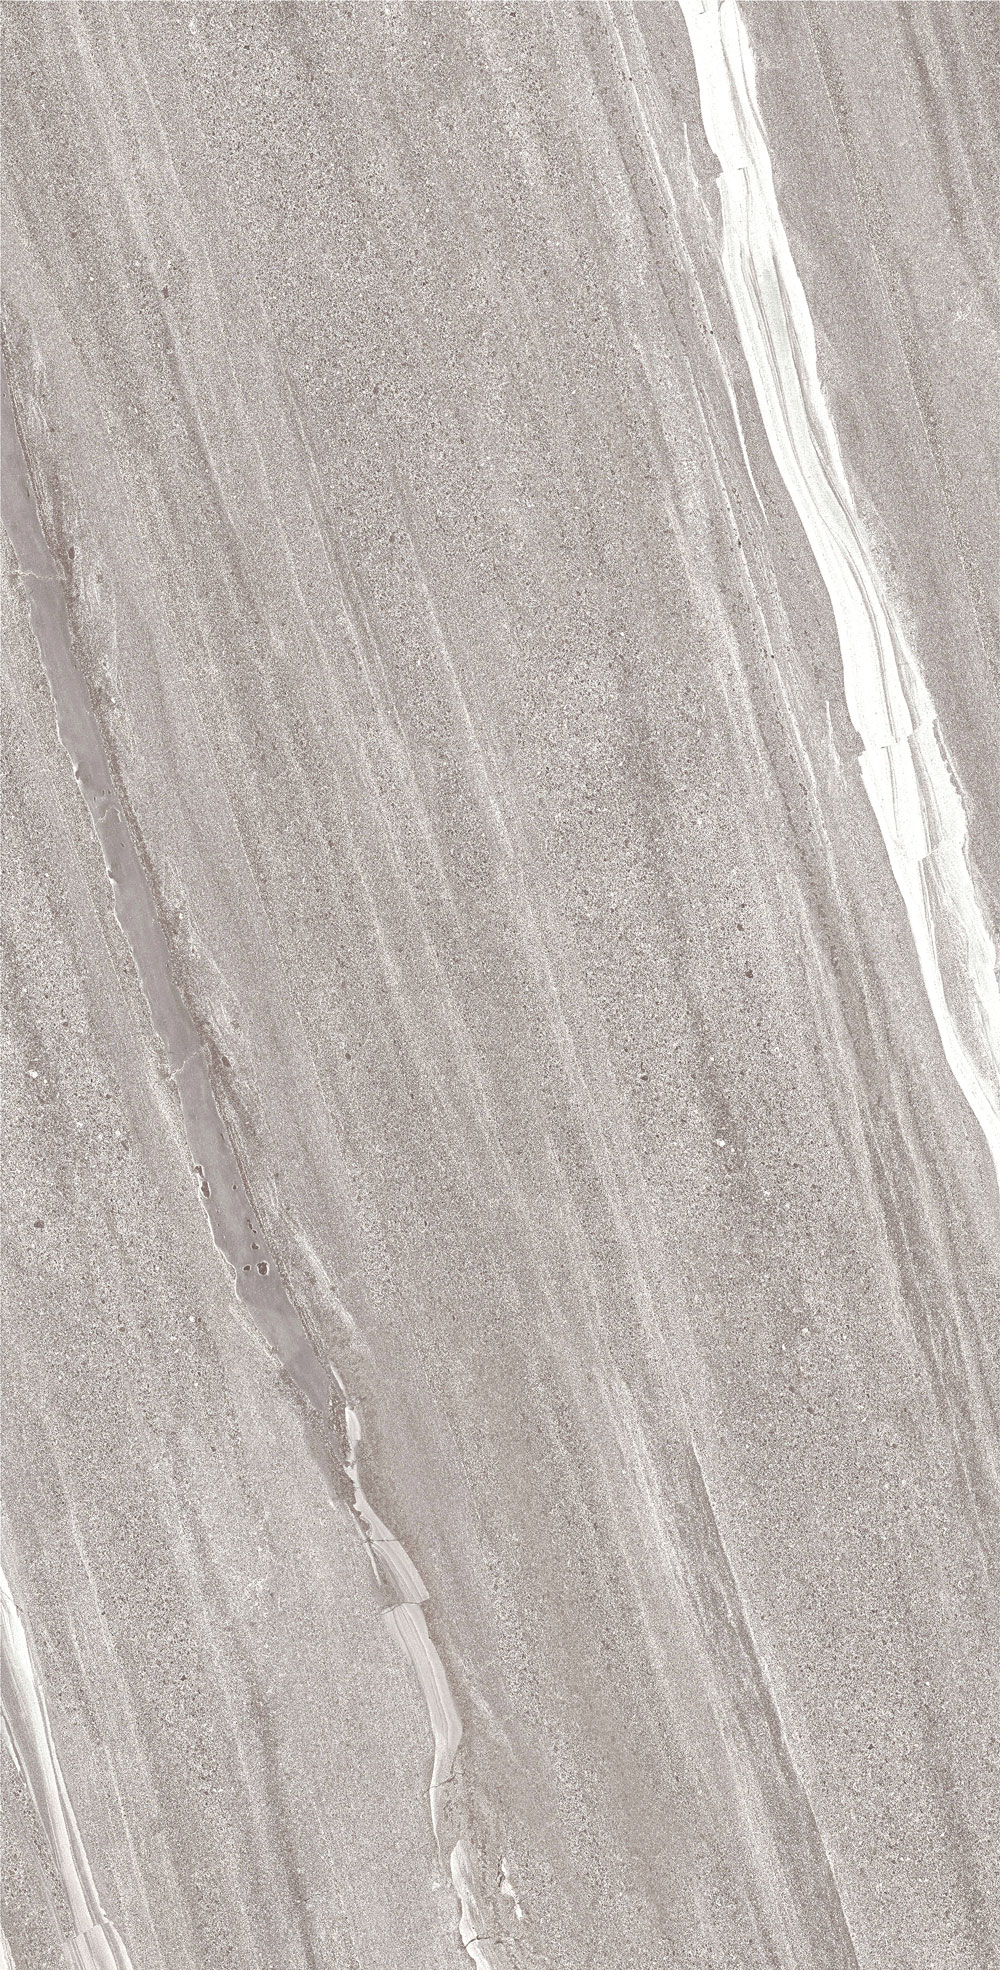 Brown Bistrot Stone Series Full Body Tiles YBIT1202